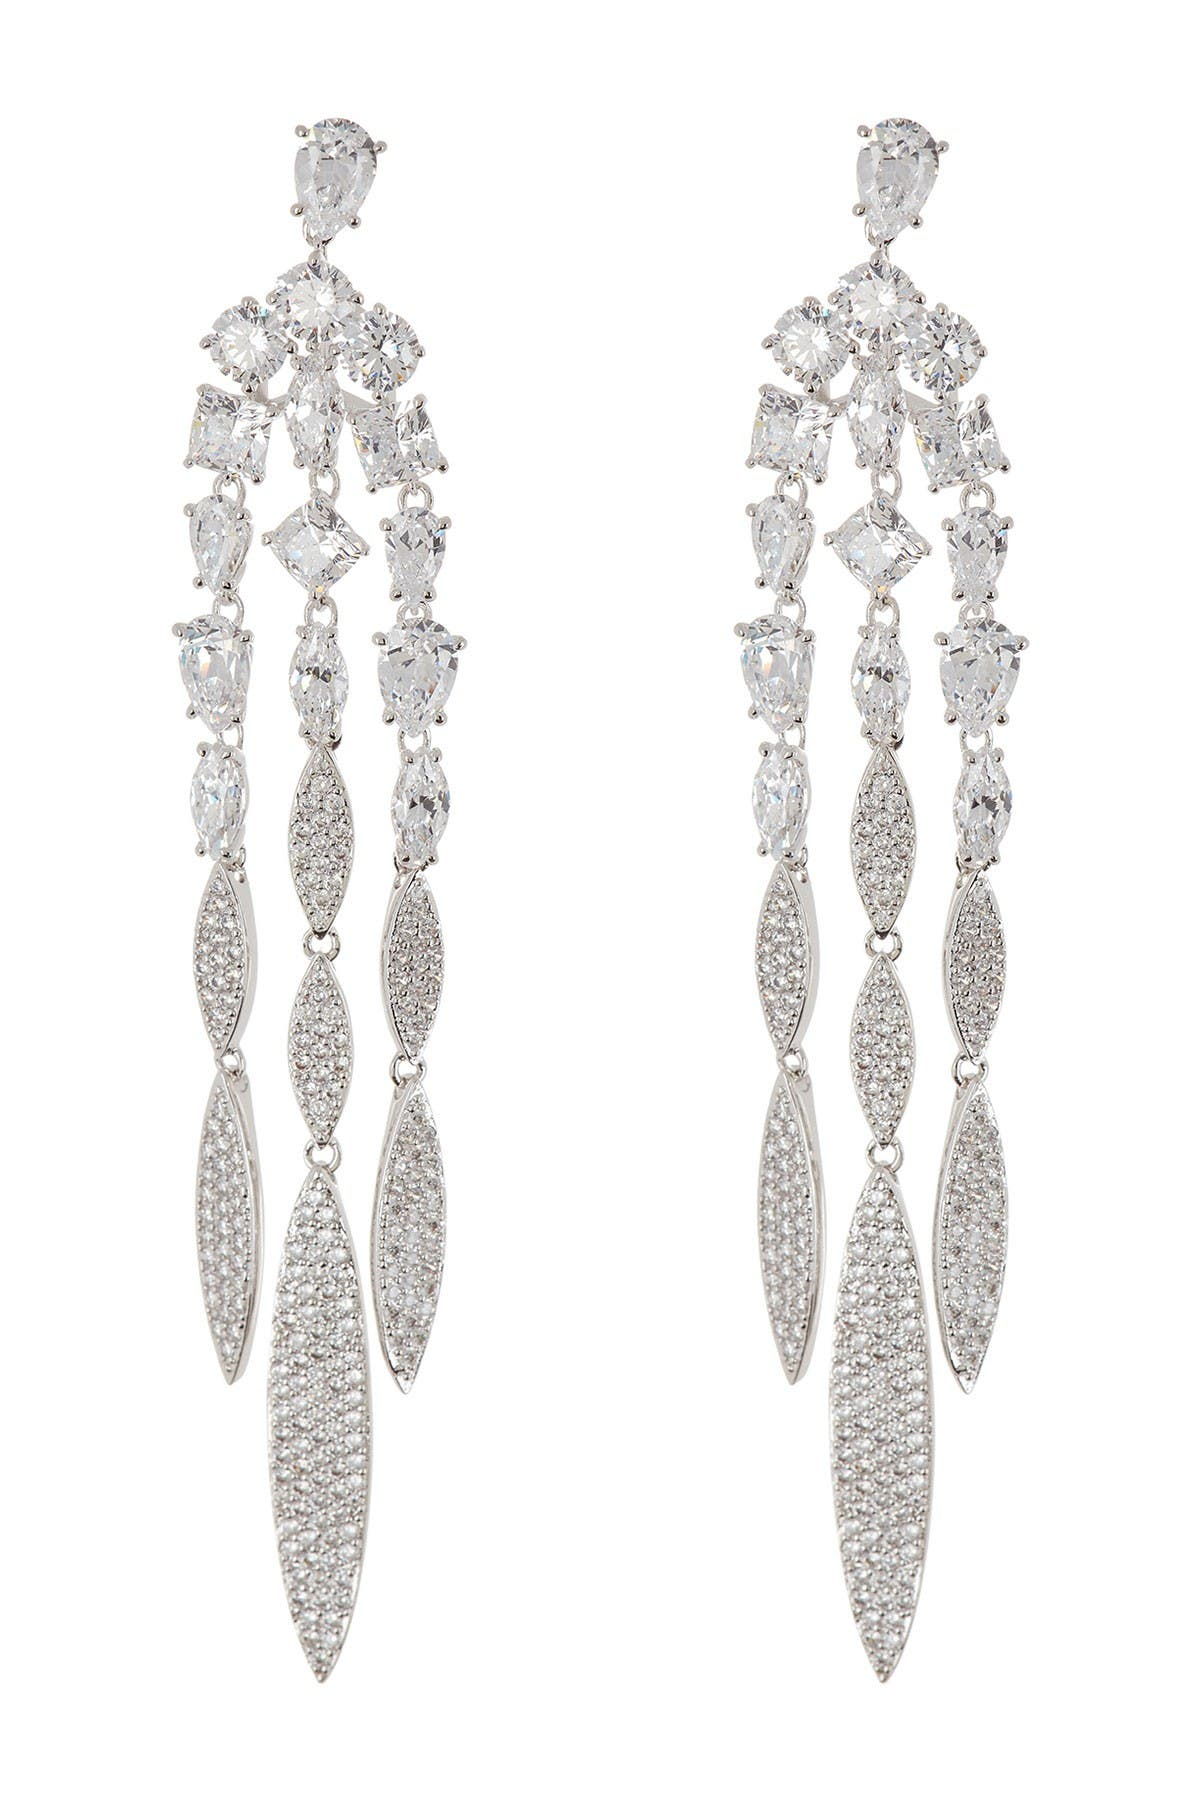 Image of NADRI CZ Chandelier Fringe Earrings